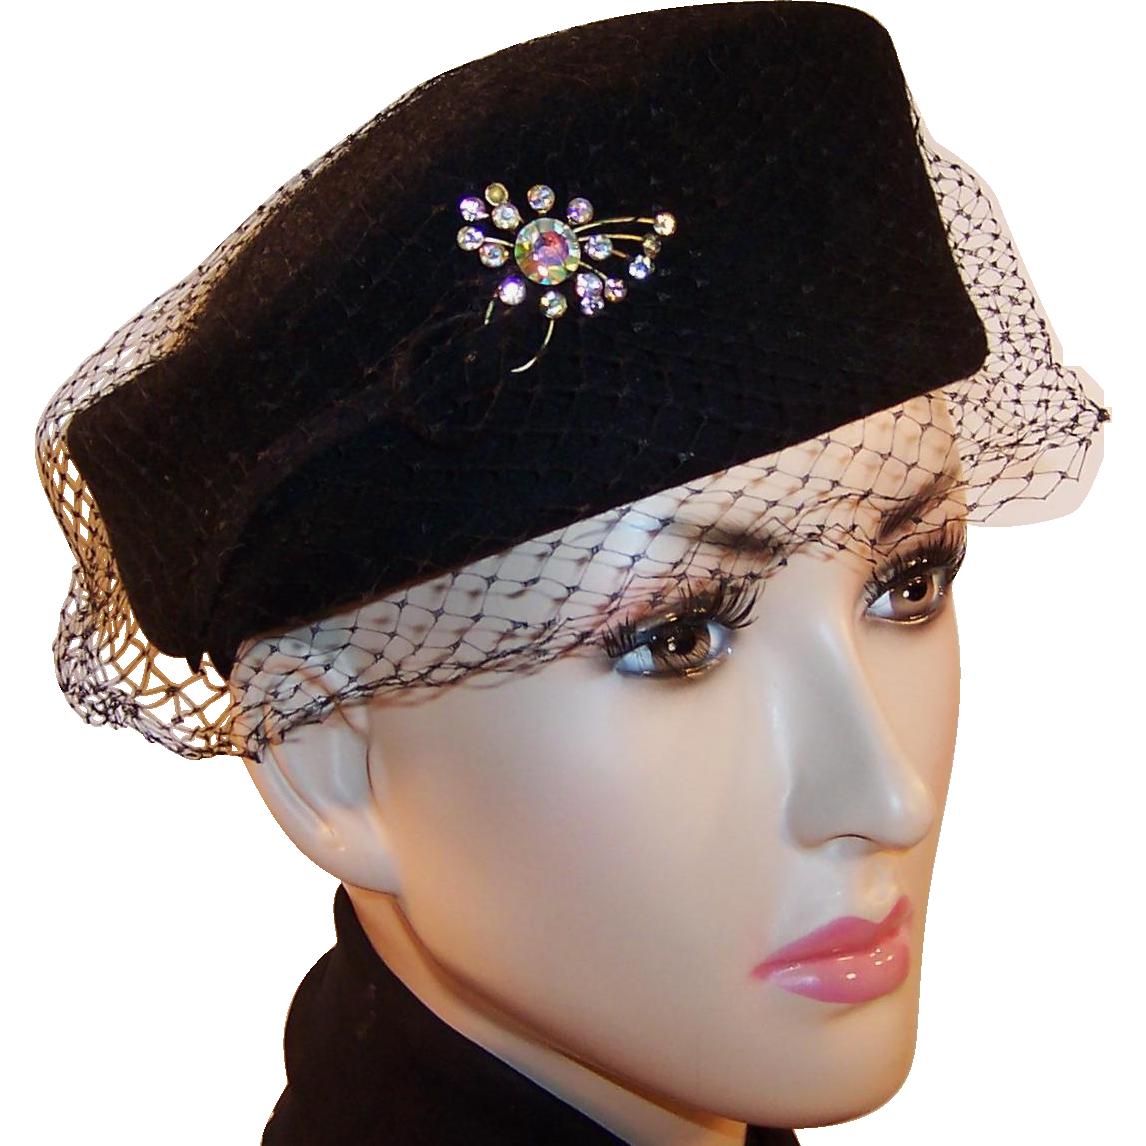 Vintage Mid-Century Black Wool Pillbox Henry Pollak Ritz Hat